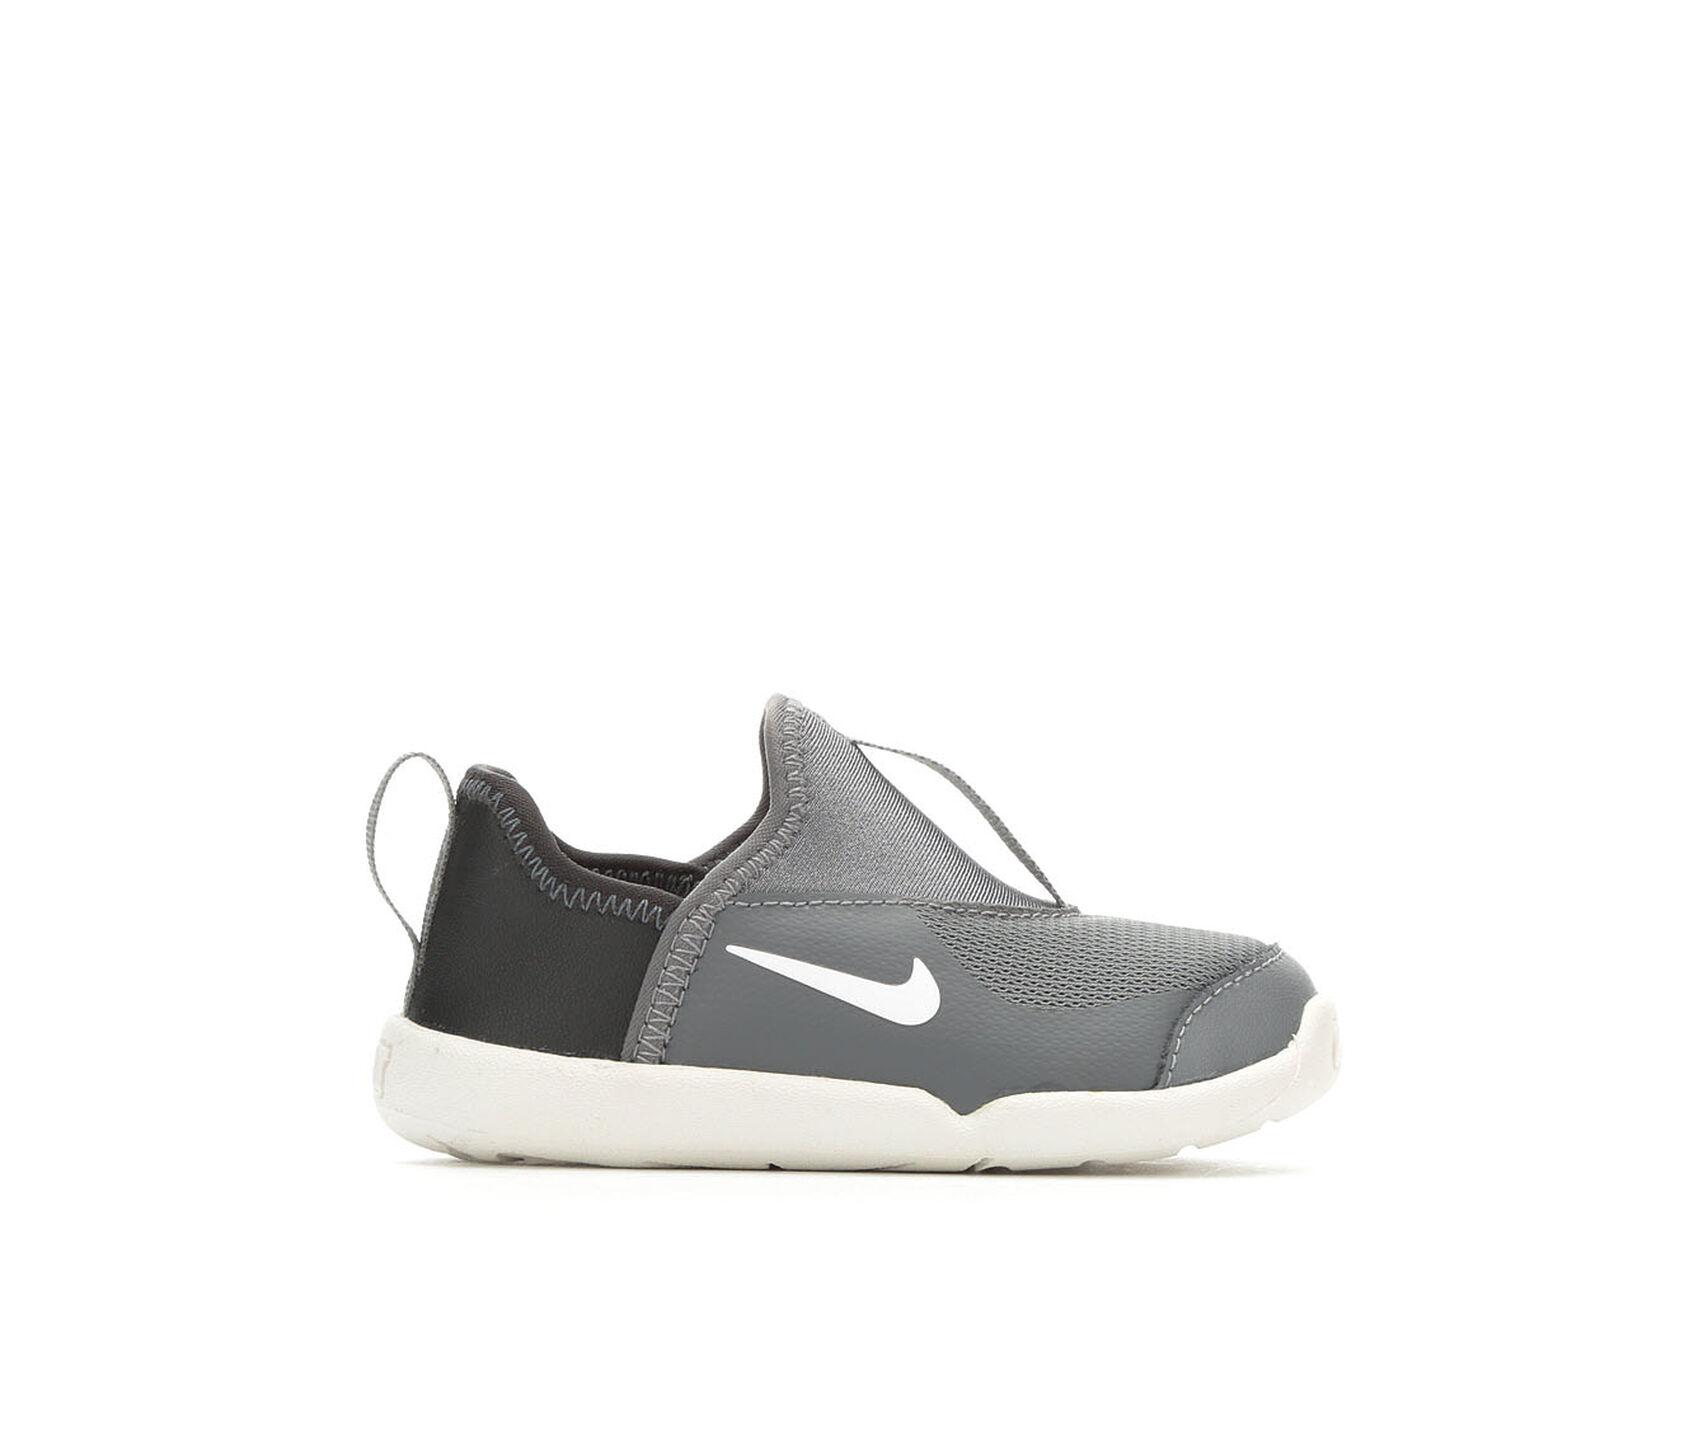 b82c8779 Kids' Nike Infant & Toddler Lil Swoosh Athletic Shoes